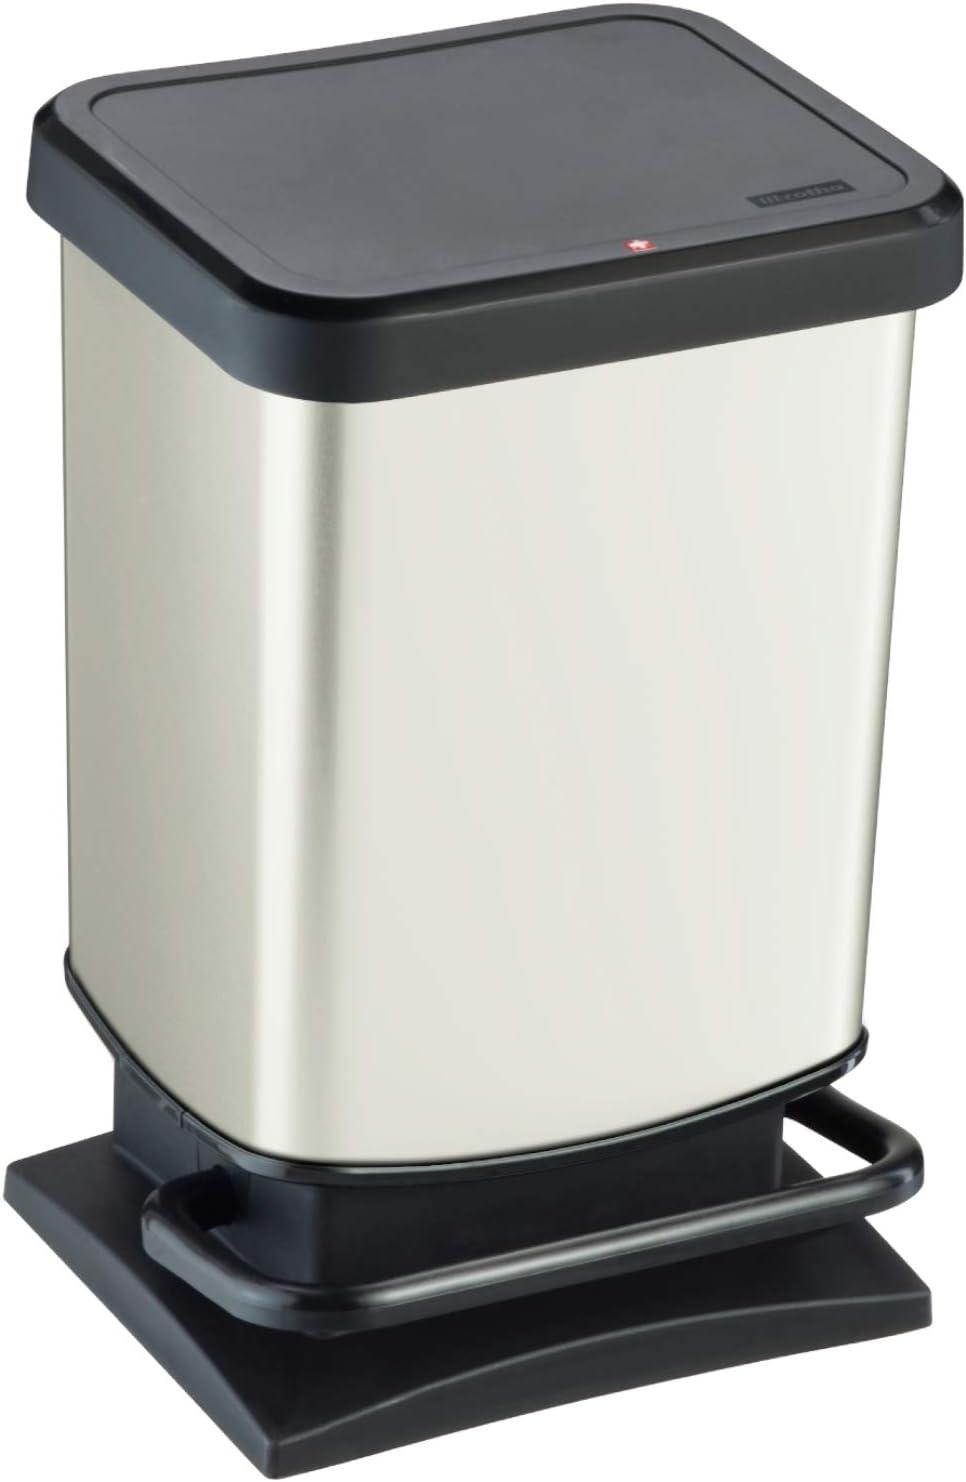 Kunststoff Cappuccino 29,3 x 26,6 x 45,7 cm PP Rotho Eco Paso M/ülleimer 20l 20 Liter